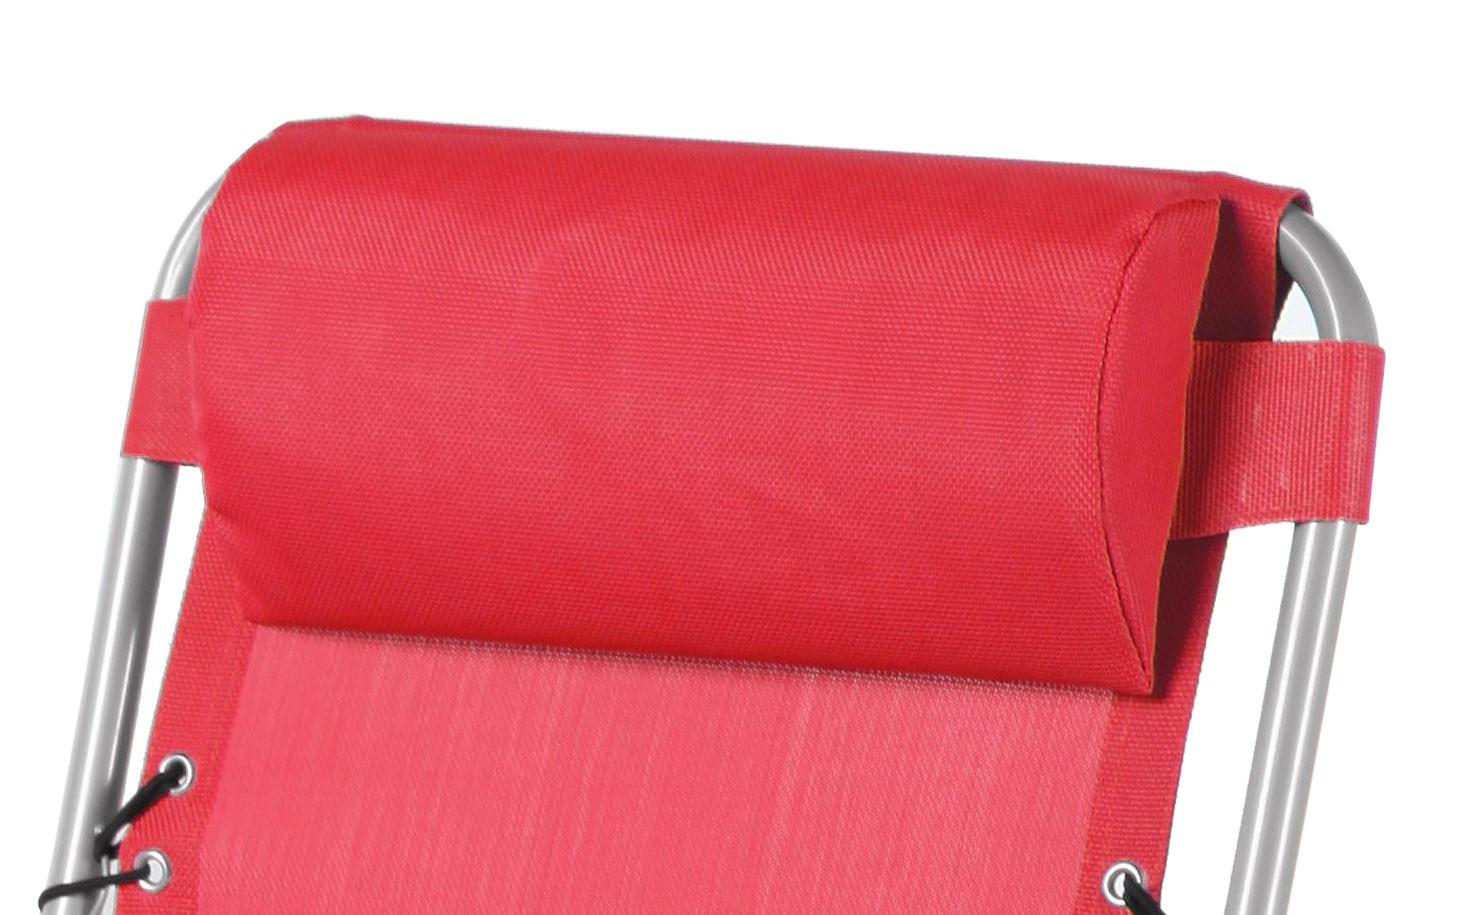 Scaun camping pliant 331.170RD structura metalica rosu 62 x 109 cm